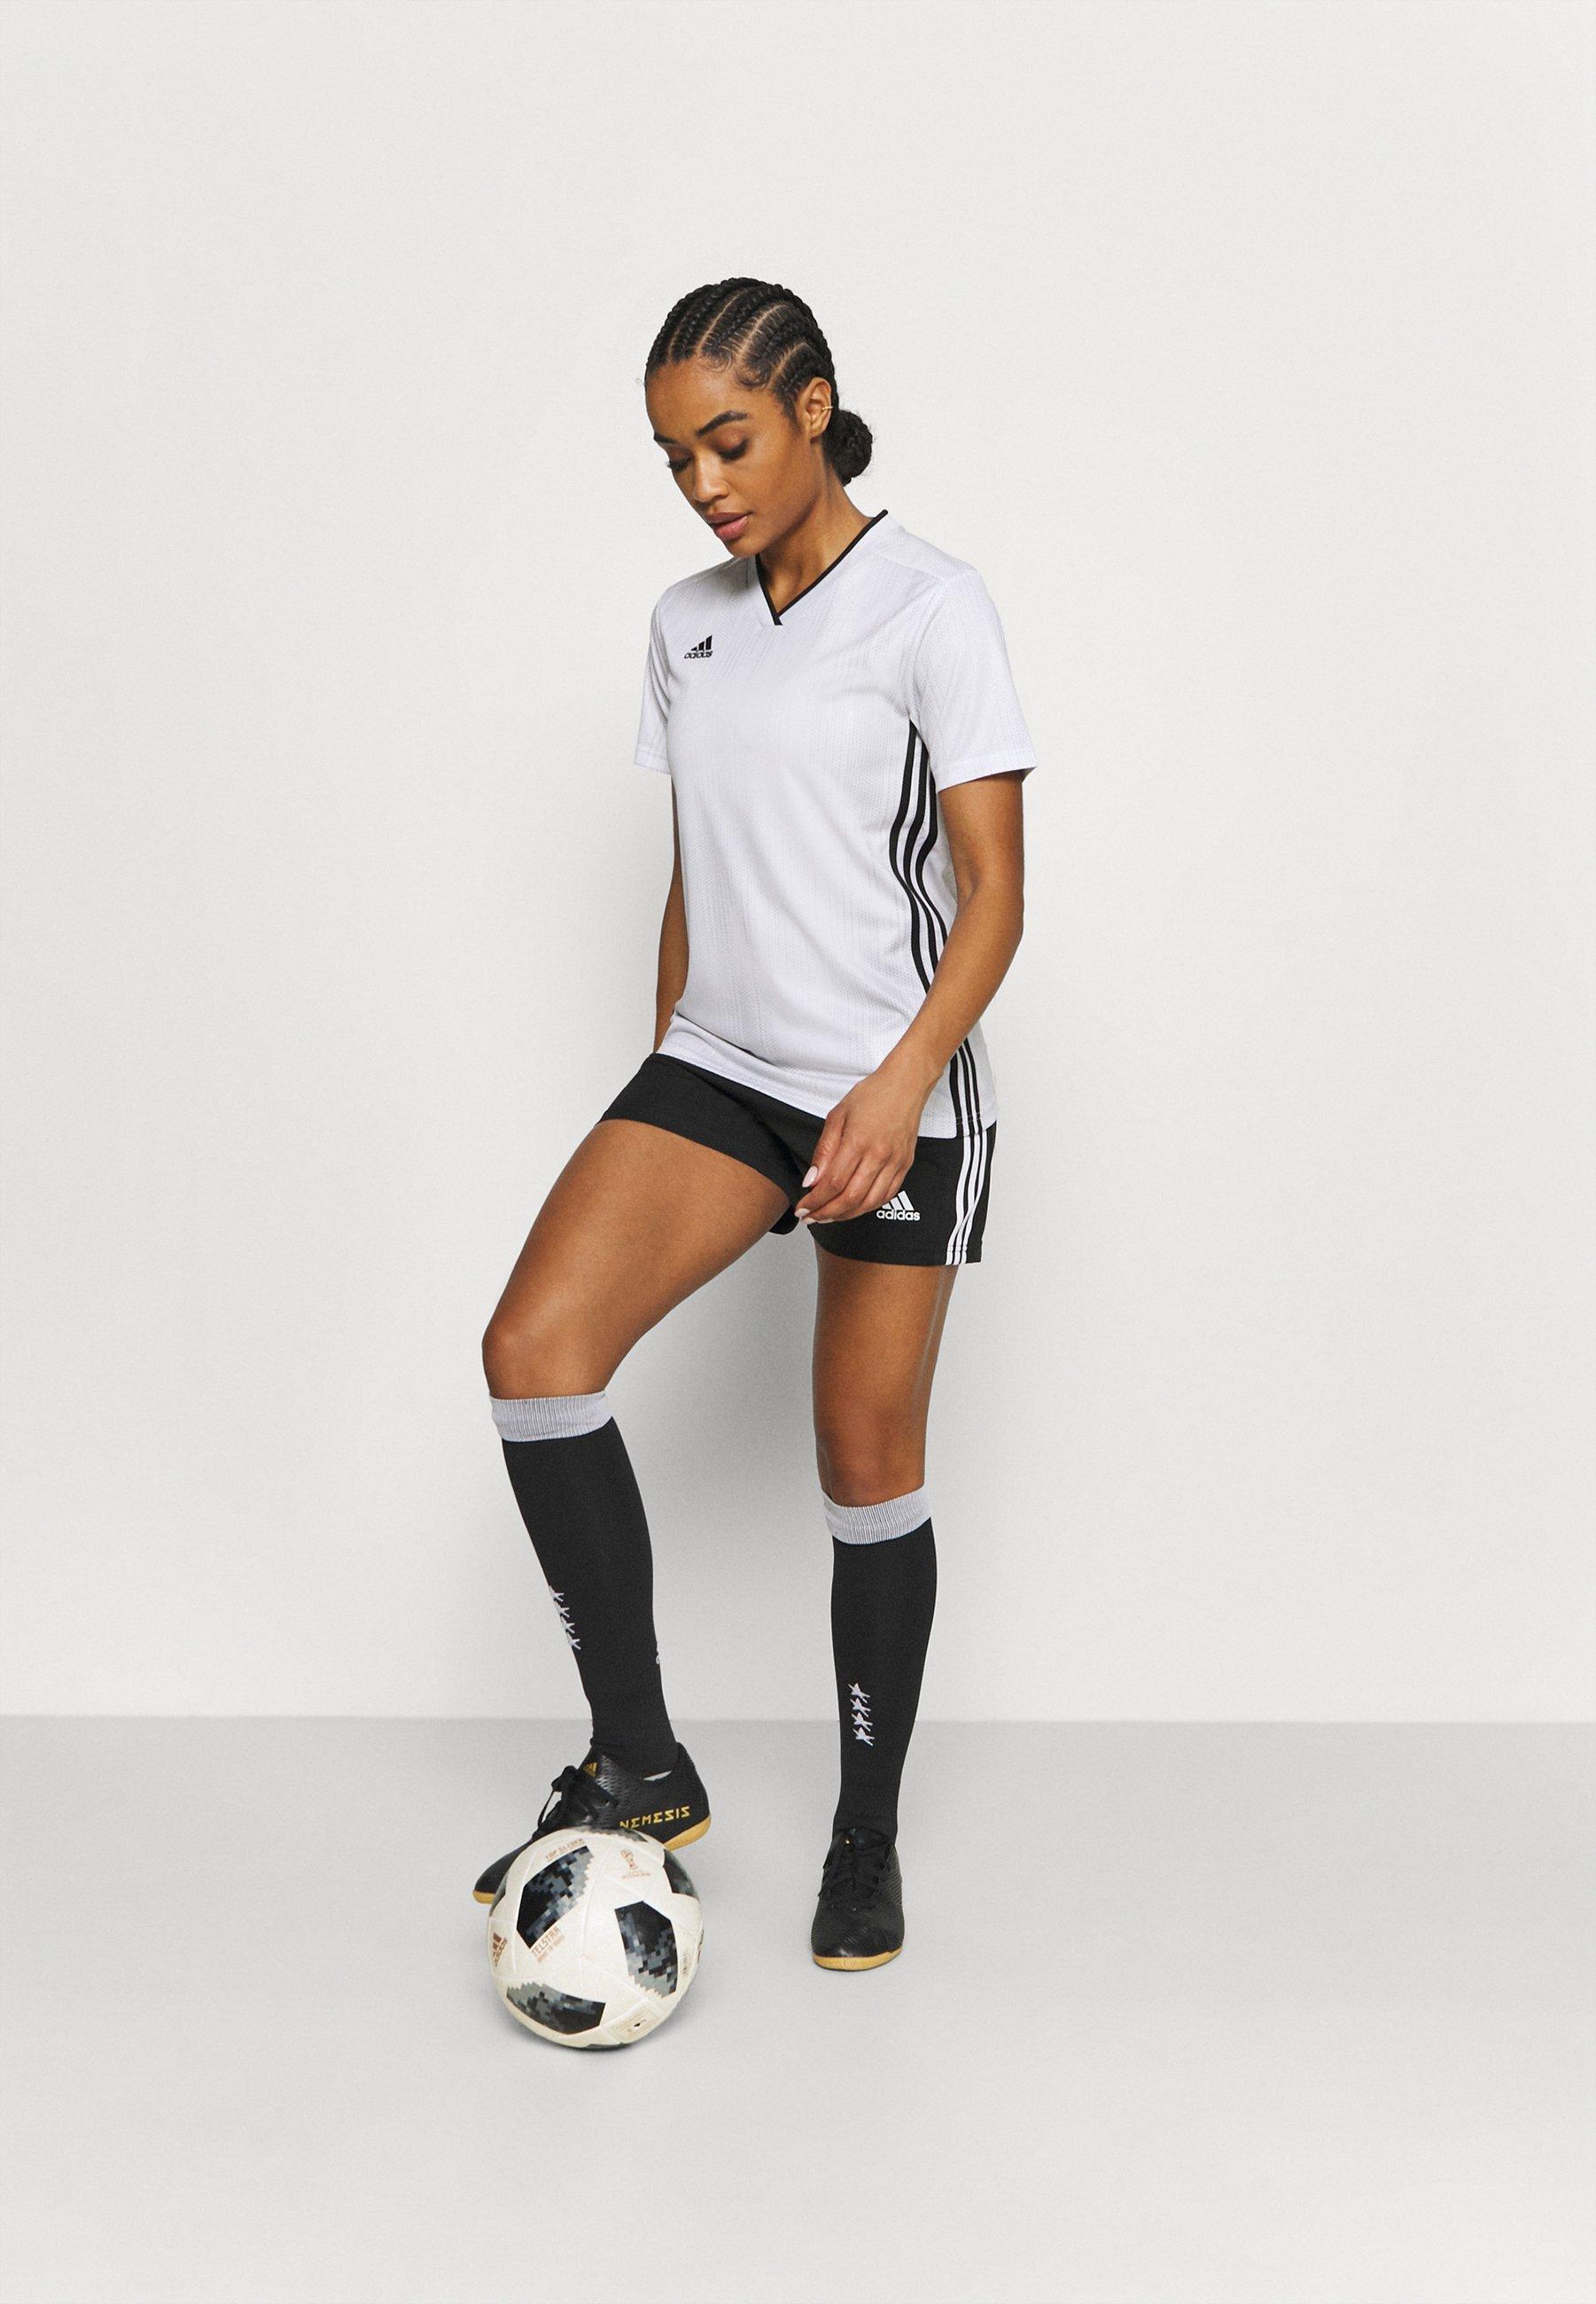 Damen SQUADRA - kurze Sporthose